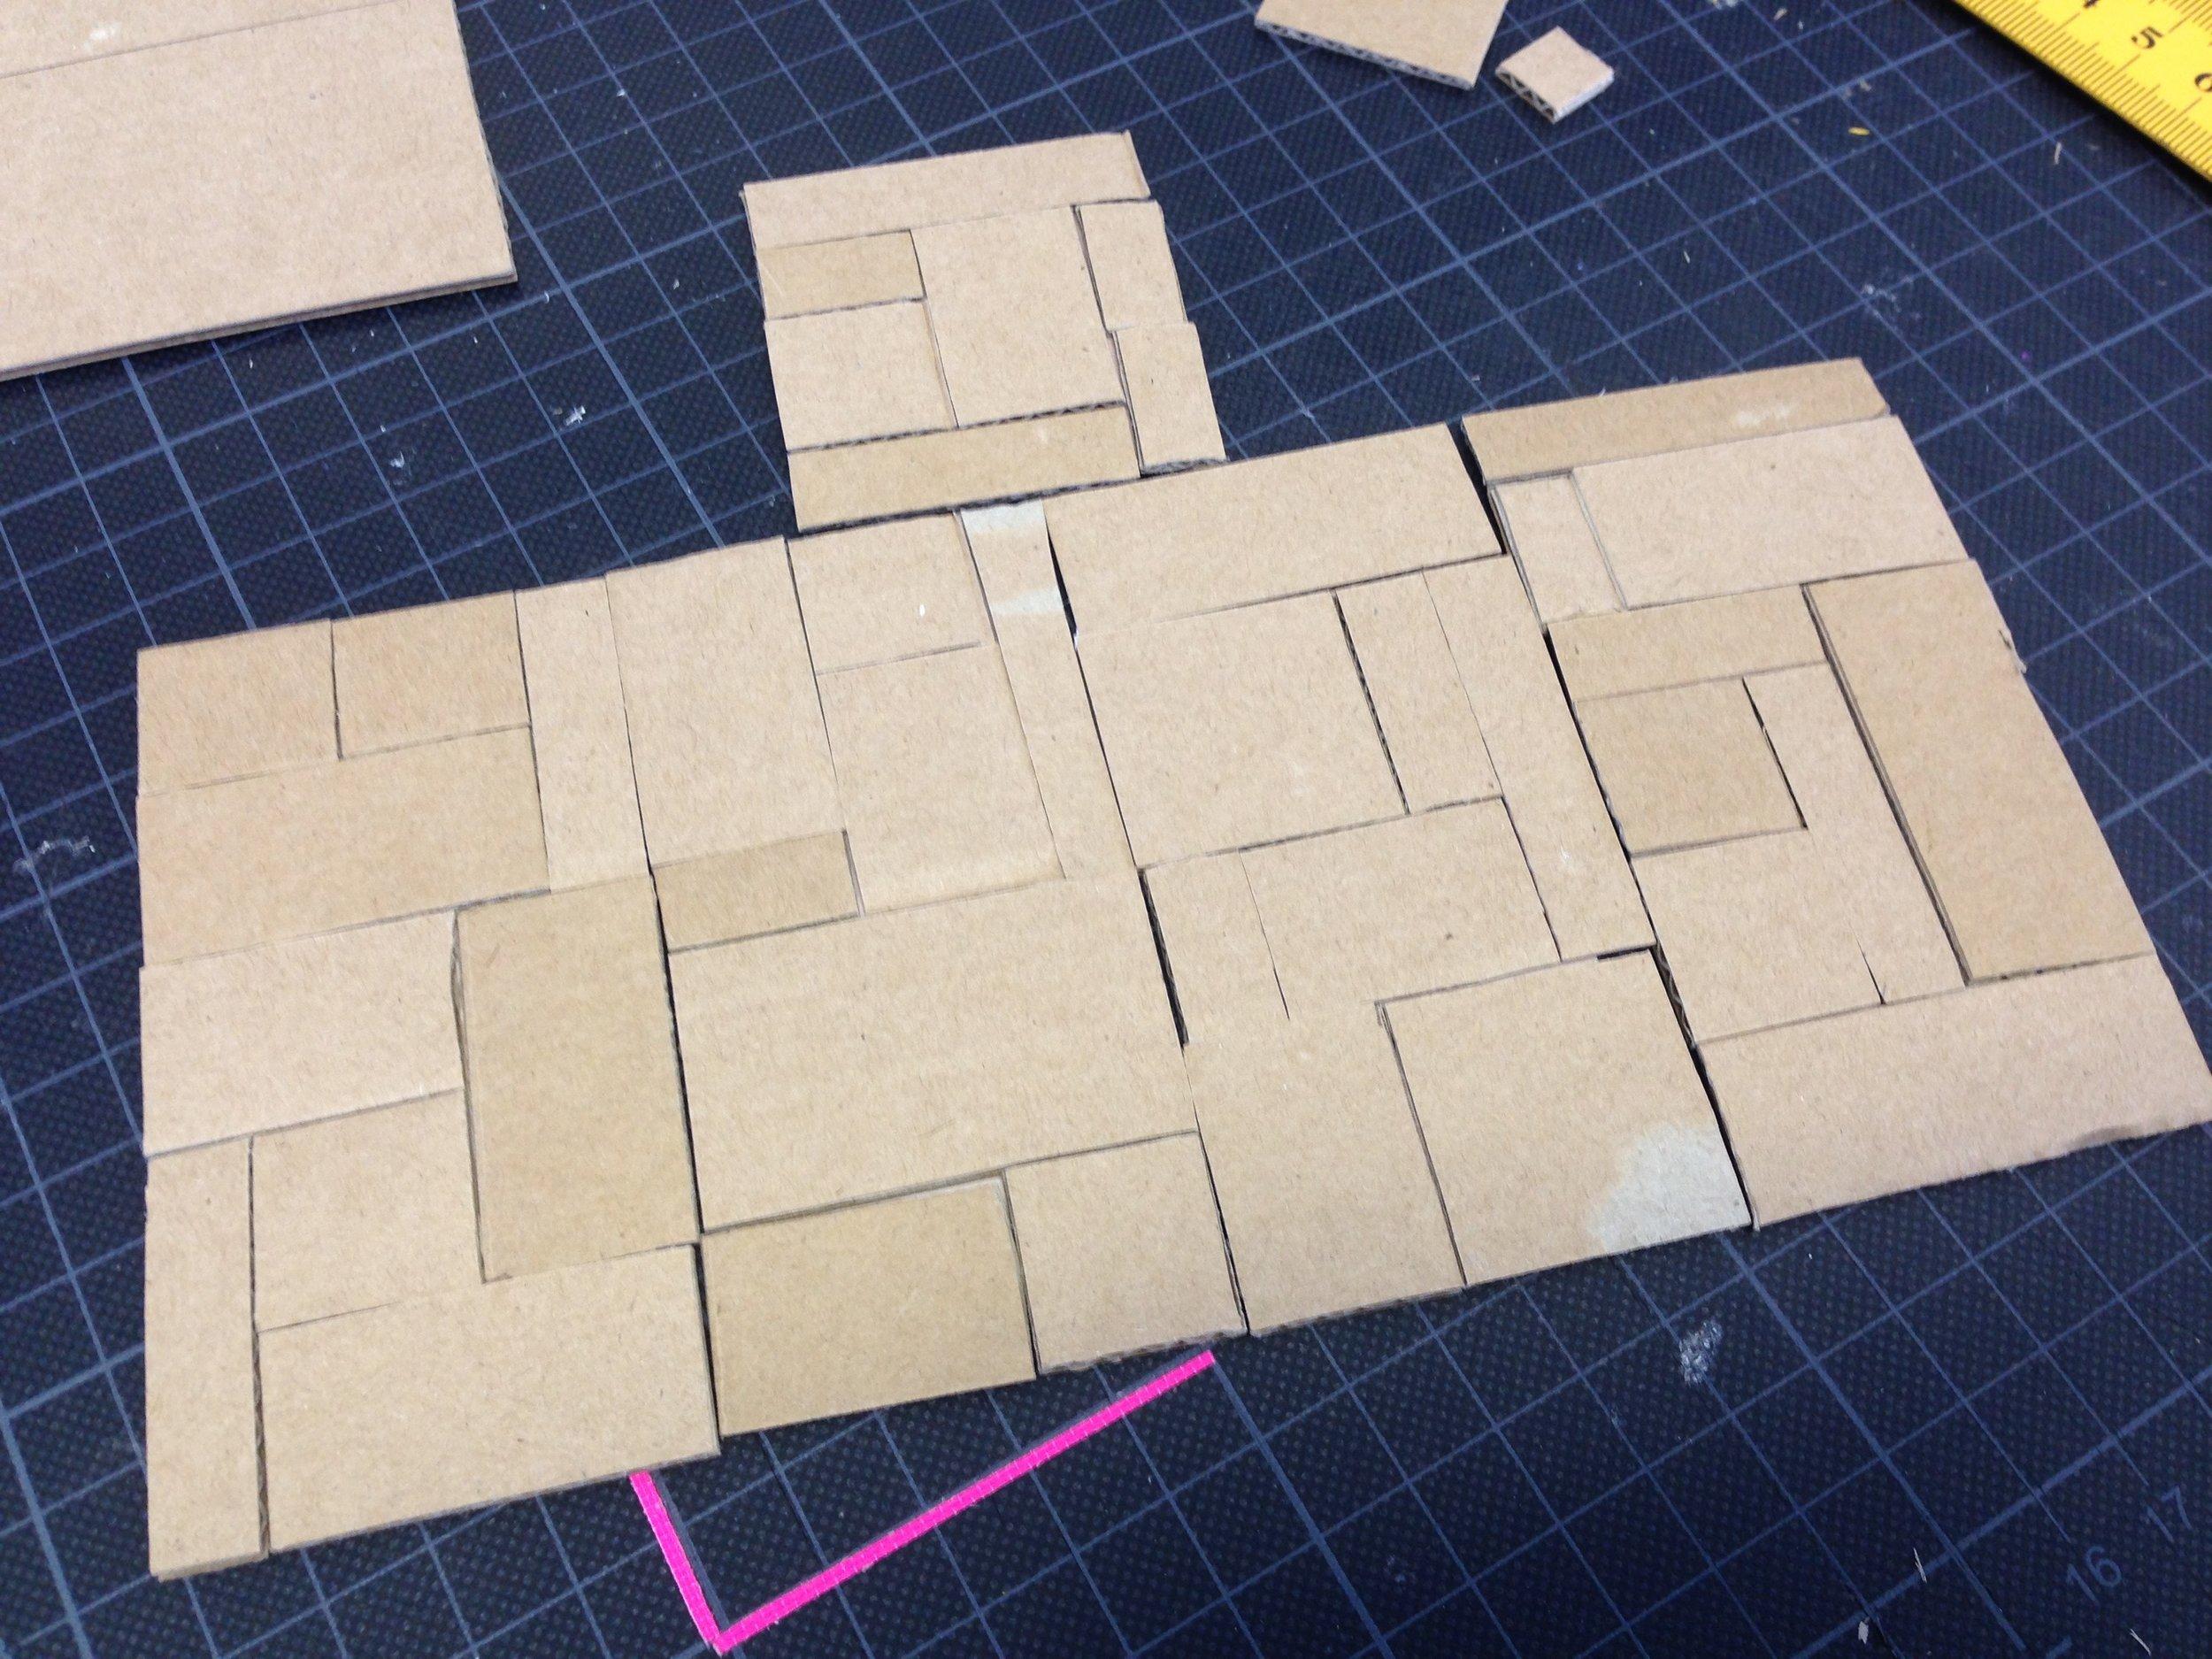 Matt's peep-hole box / Test models